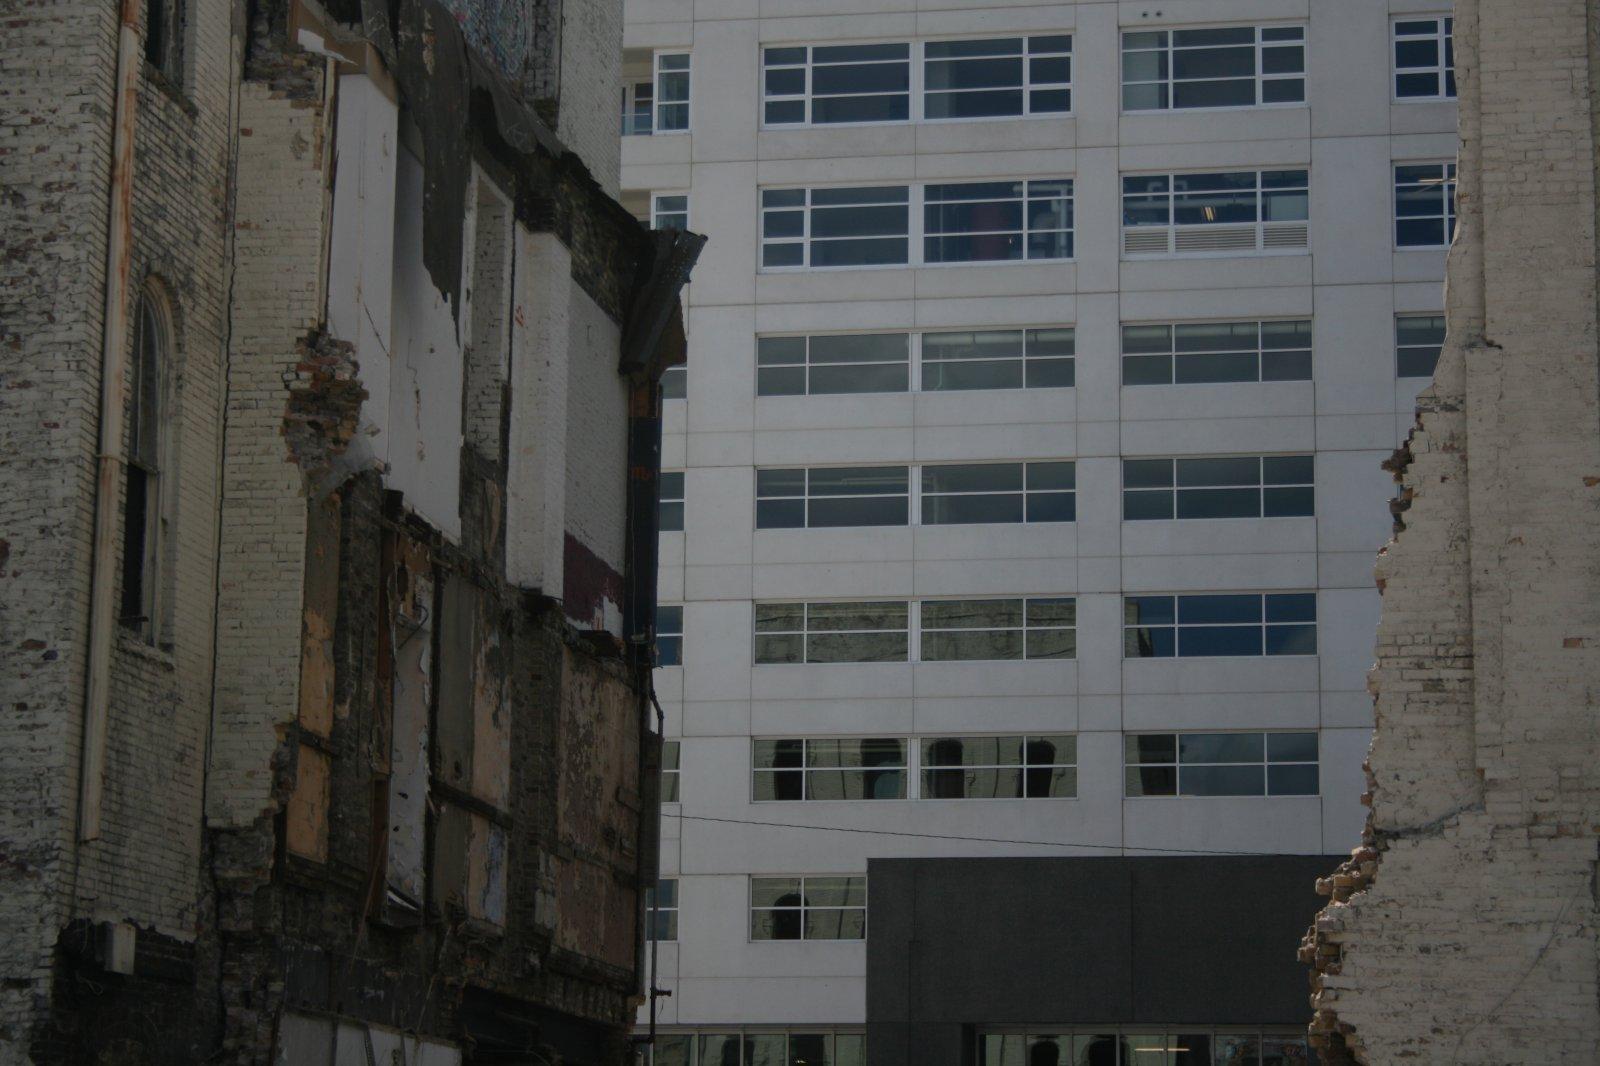 Demolition of the Sydney Hih.